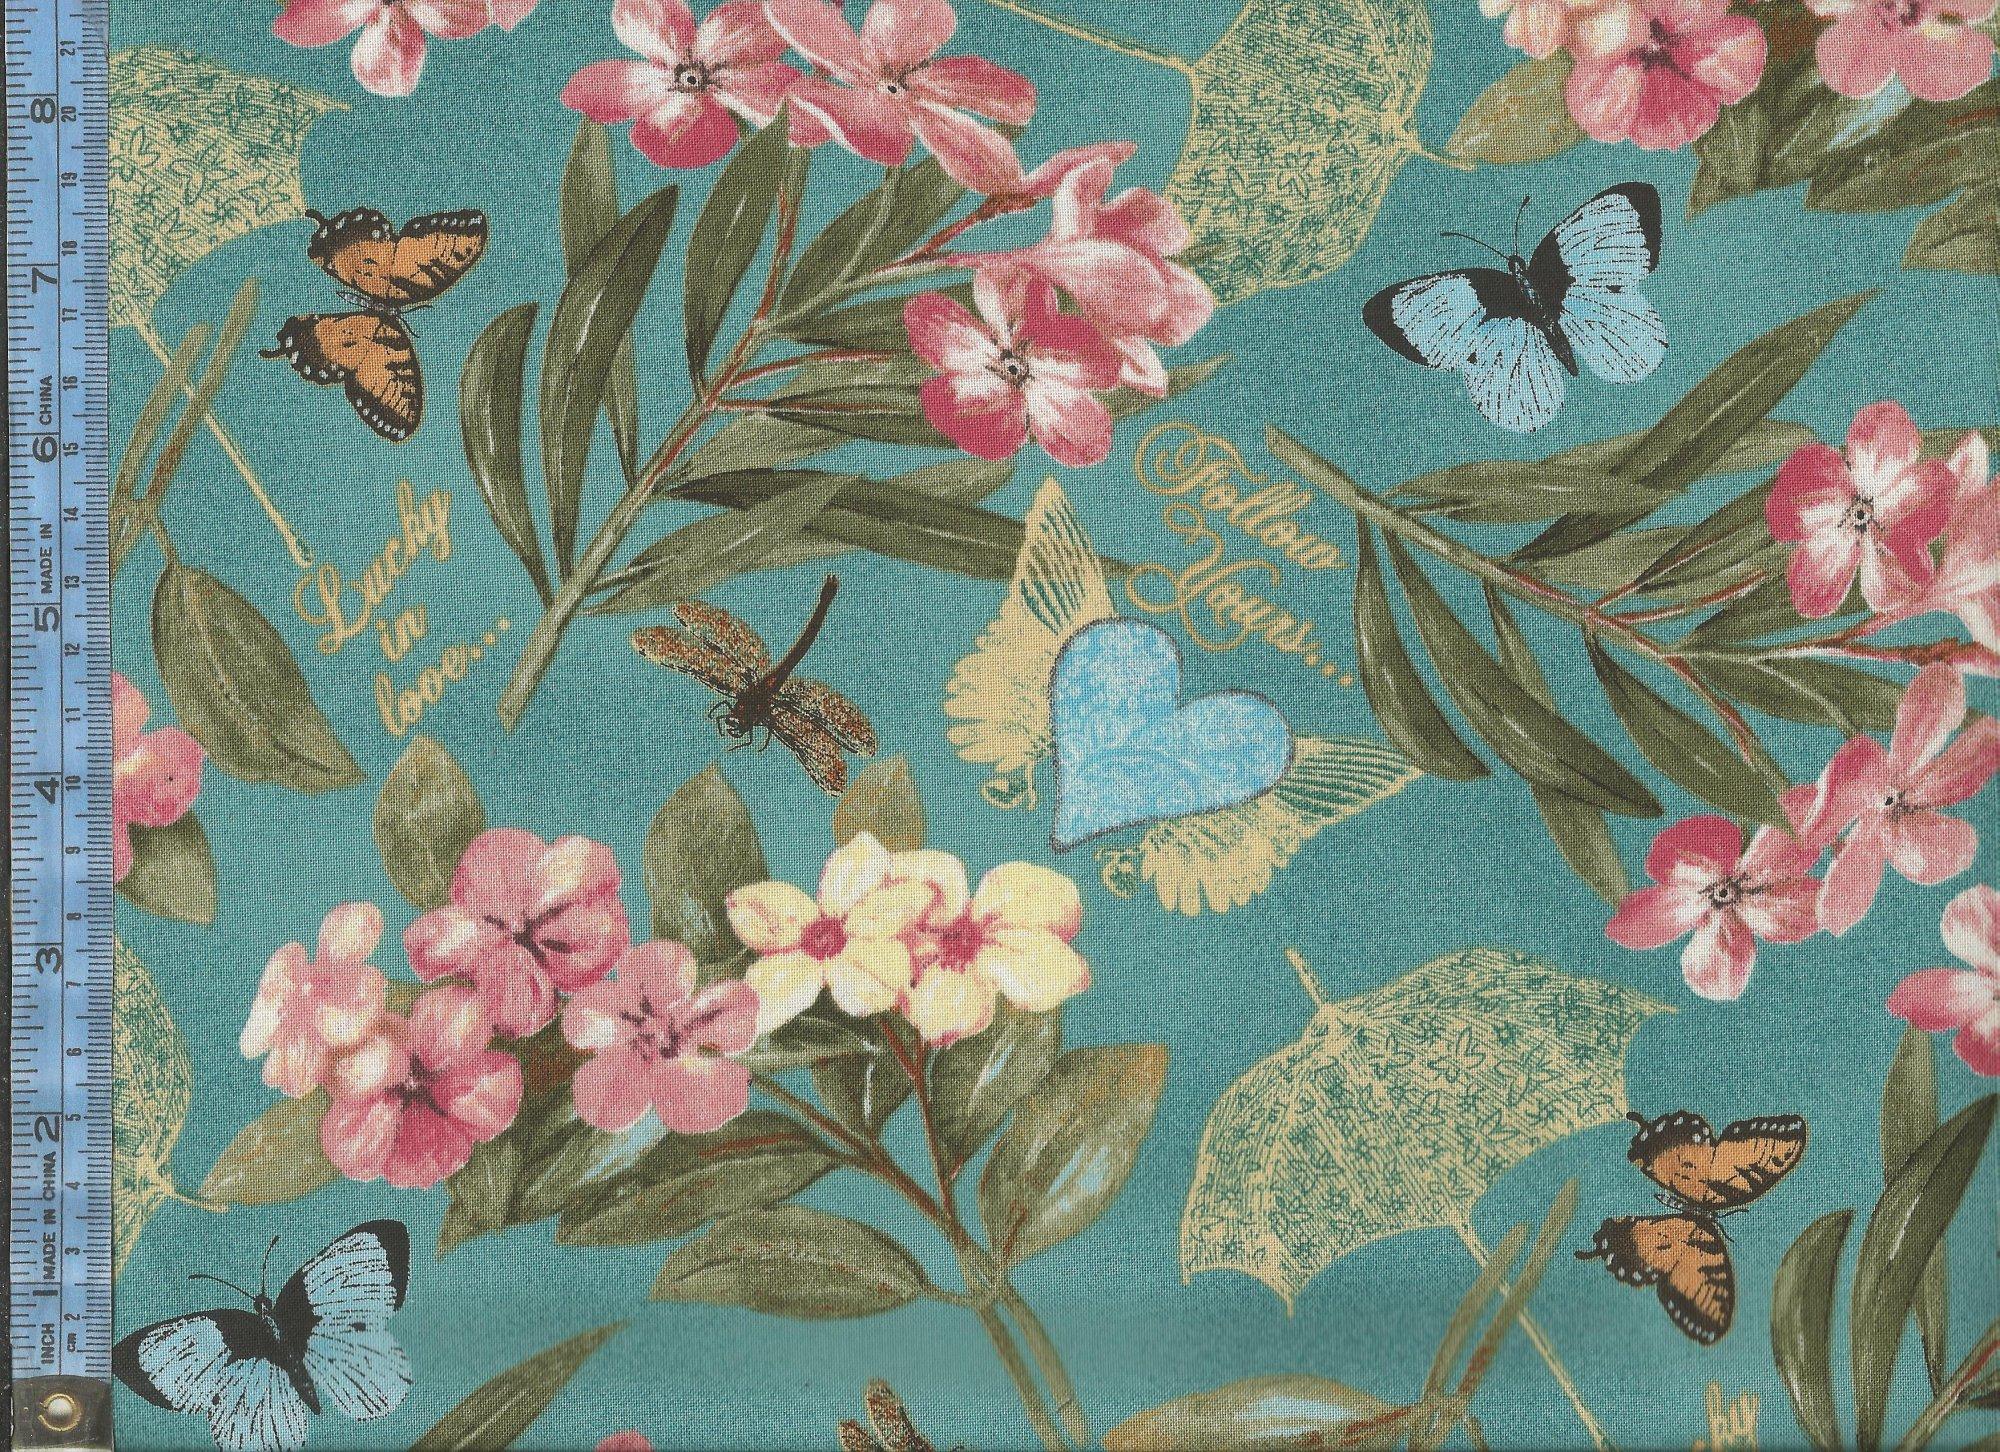 Garden Hideaway   14601 1401 pink flowers with light blue 2000x1452